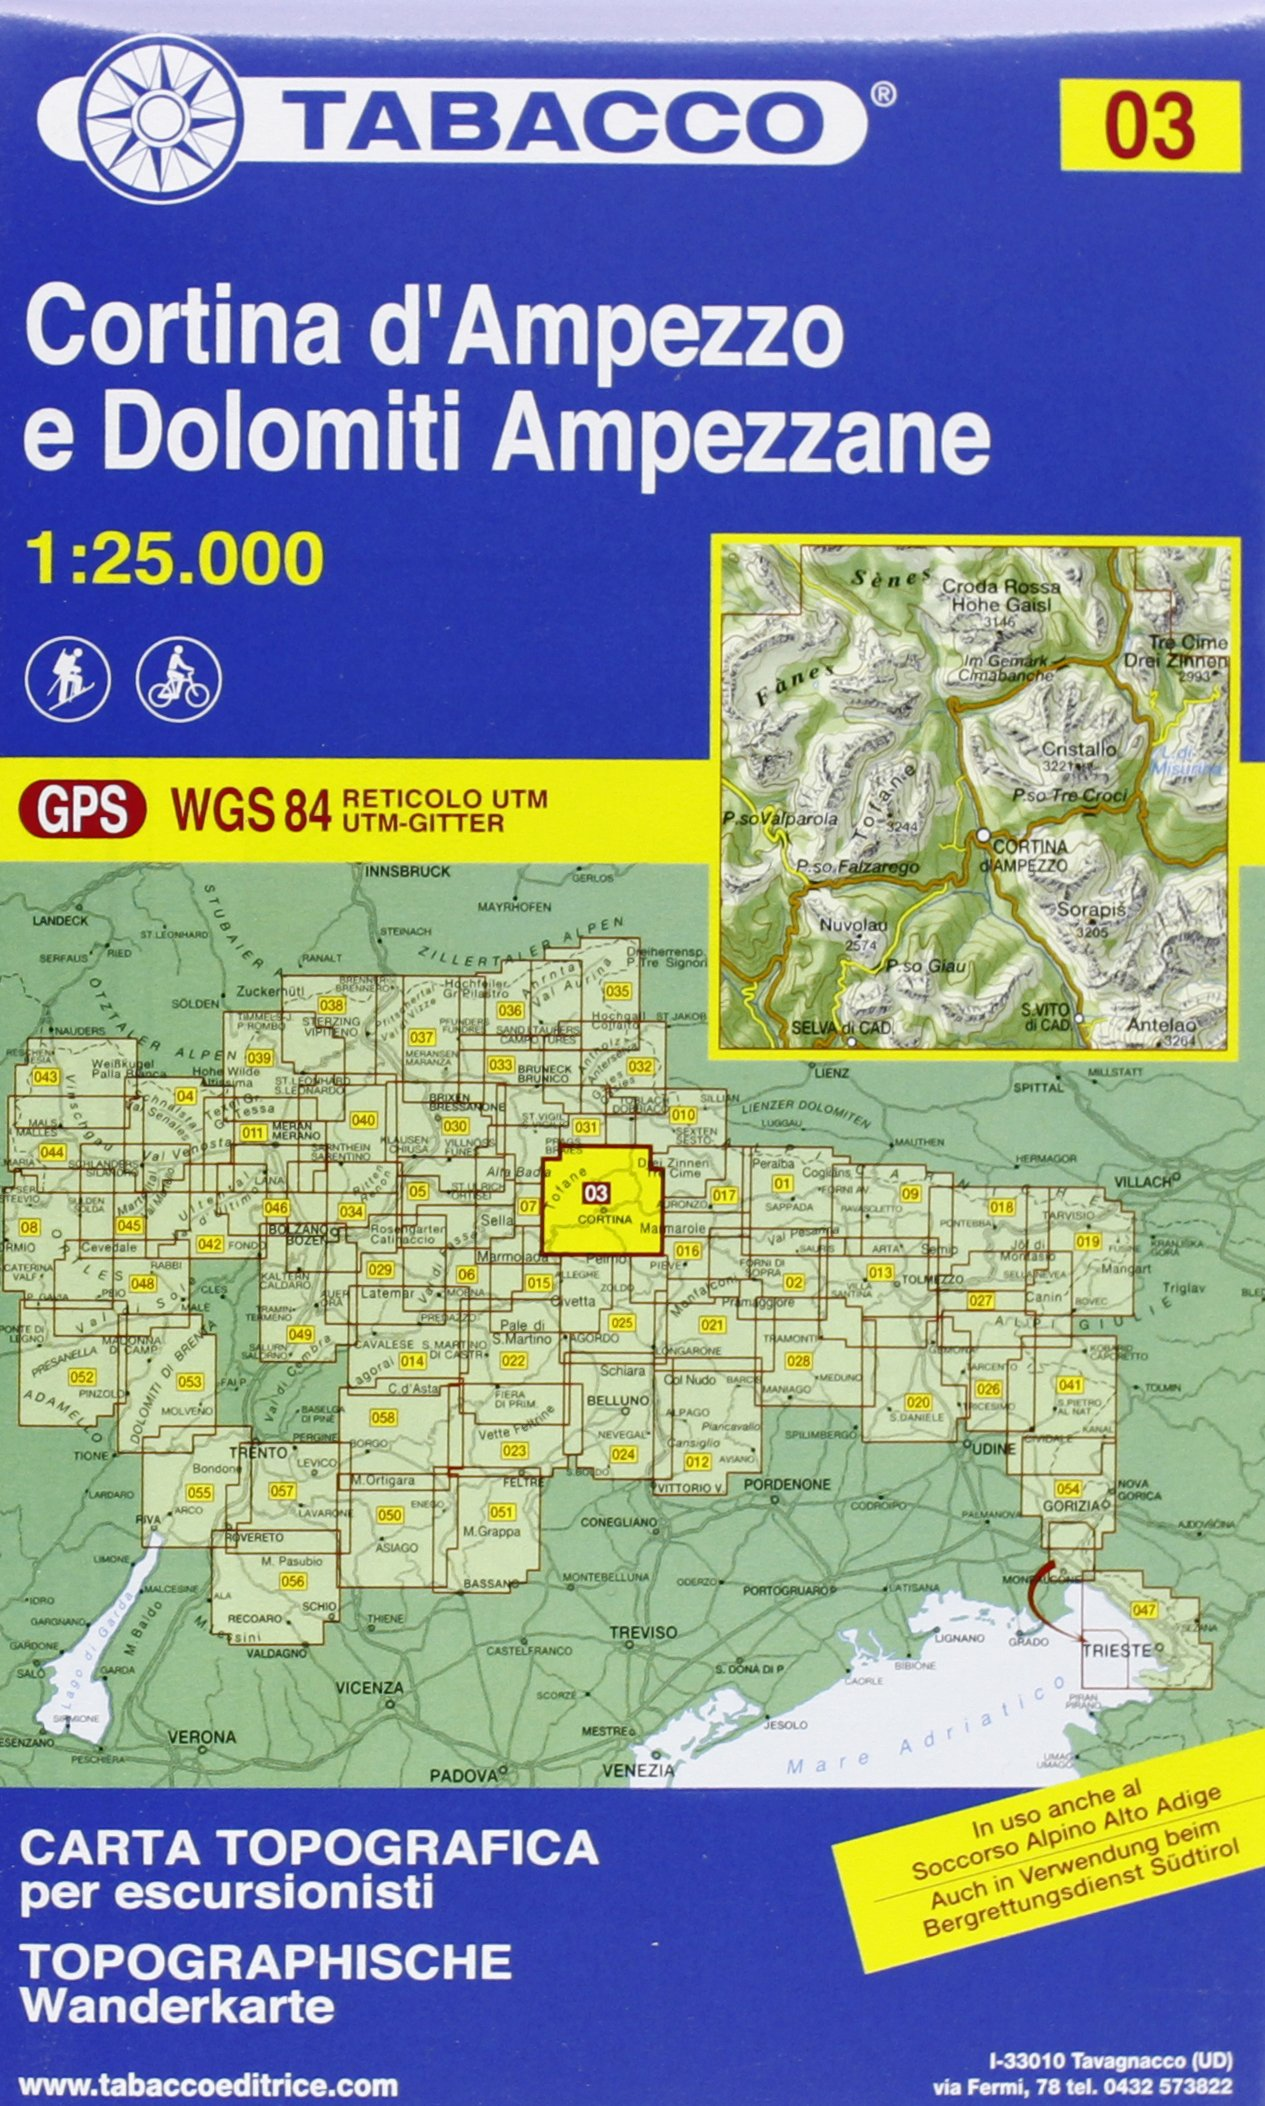 CORTINA D'AMPEZZO E DOLOMITI AMPEZZANE 03 (Italien) Carte – Carte pliée, 2011 TABACCO 8883150031 Karten / Stadtpläne / Europa Italy